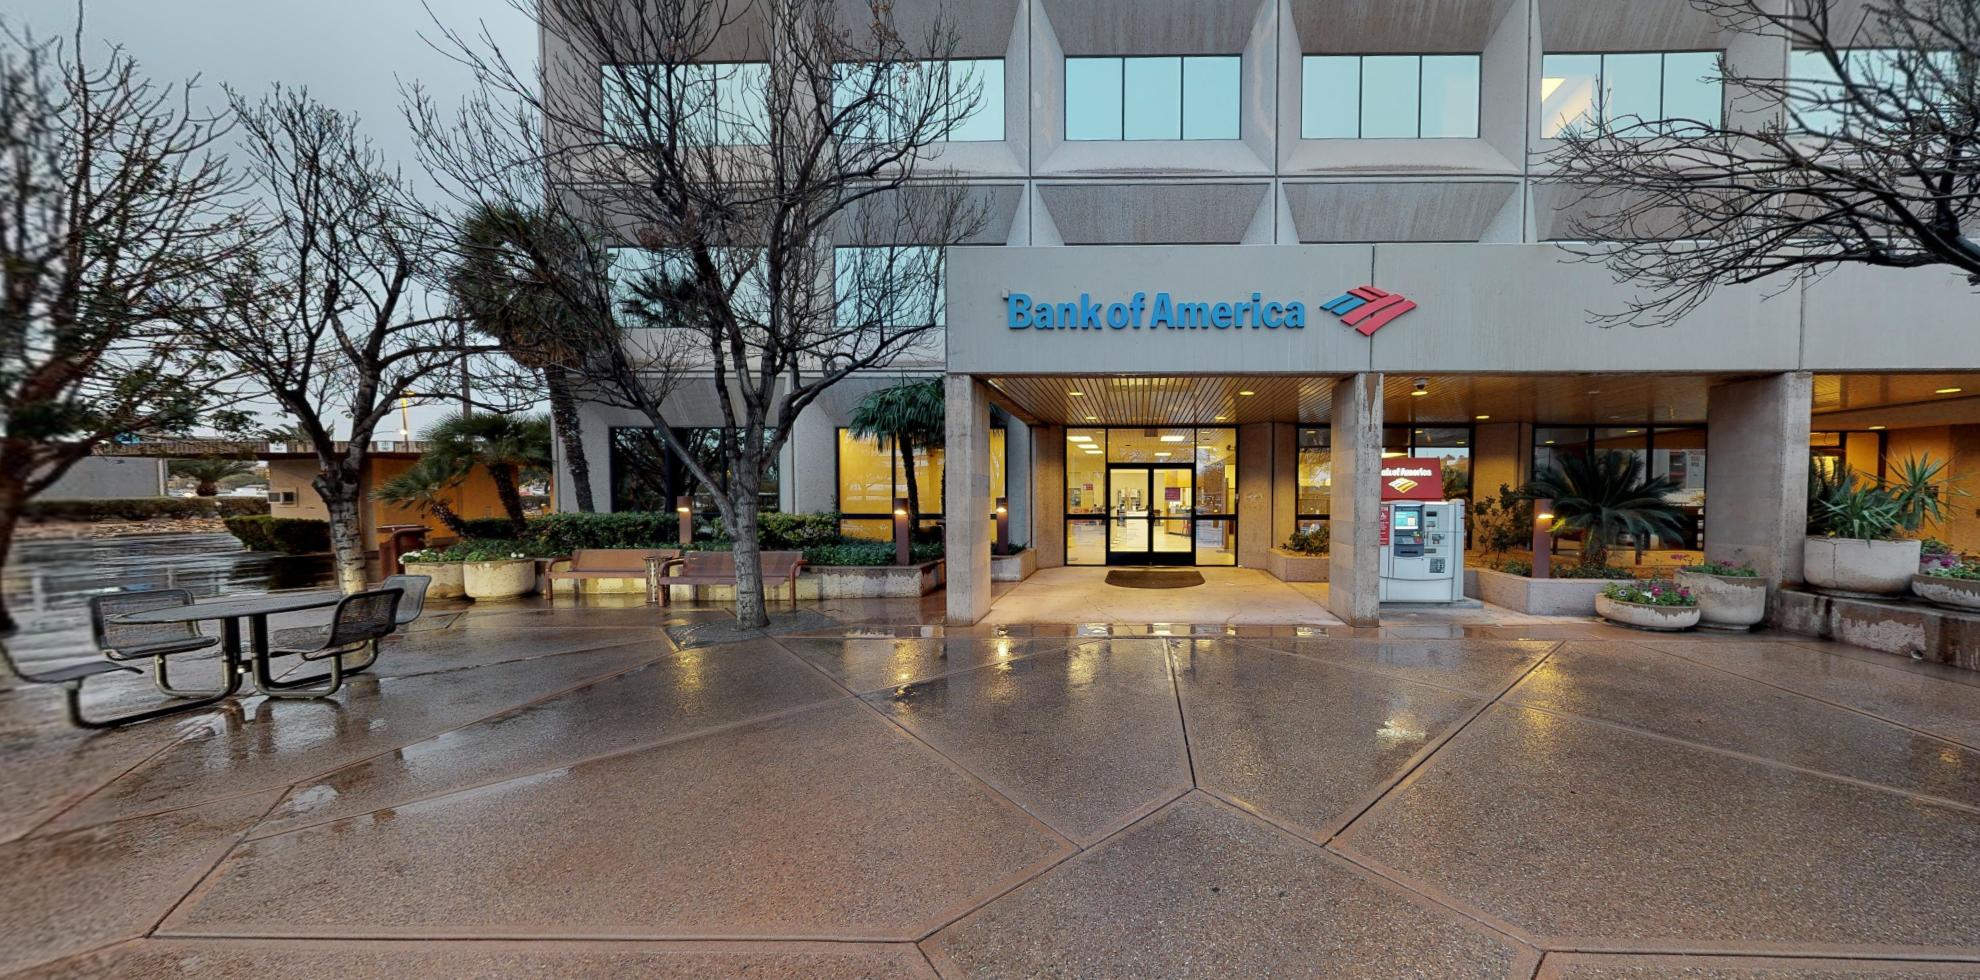 Bank of America financial center with drive-thru ATM   6245 E Broadway Blvd, Tucson, AZ 85711